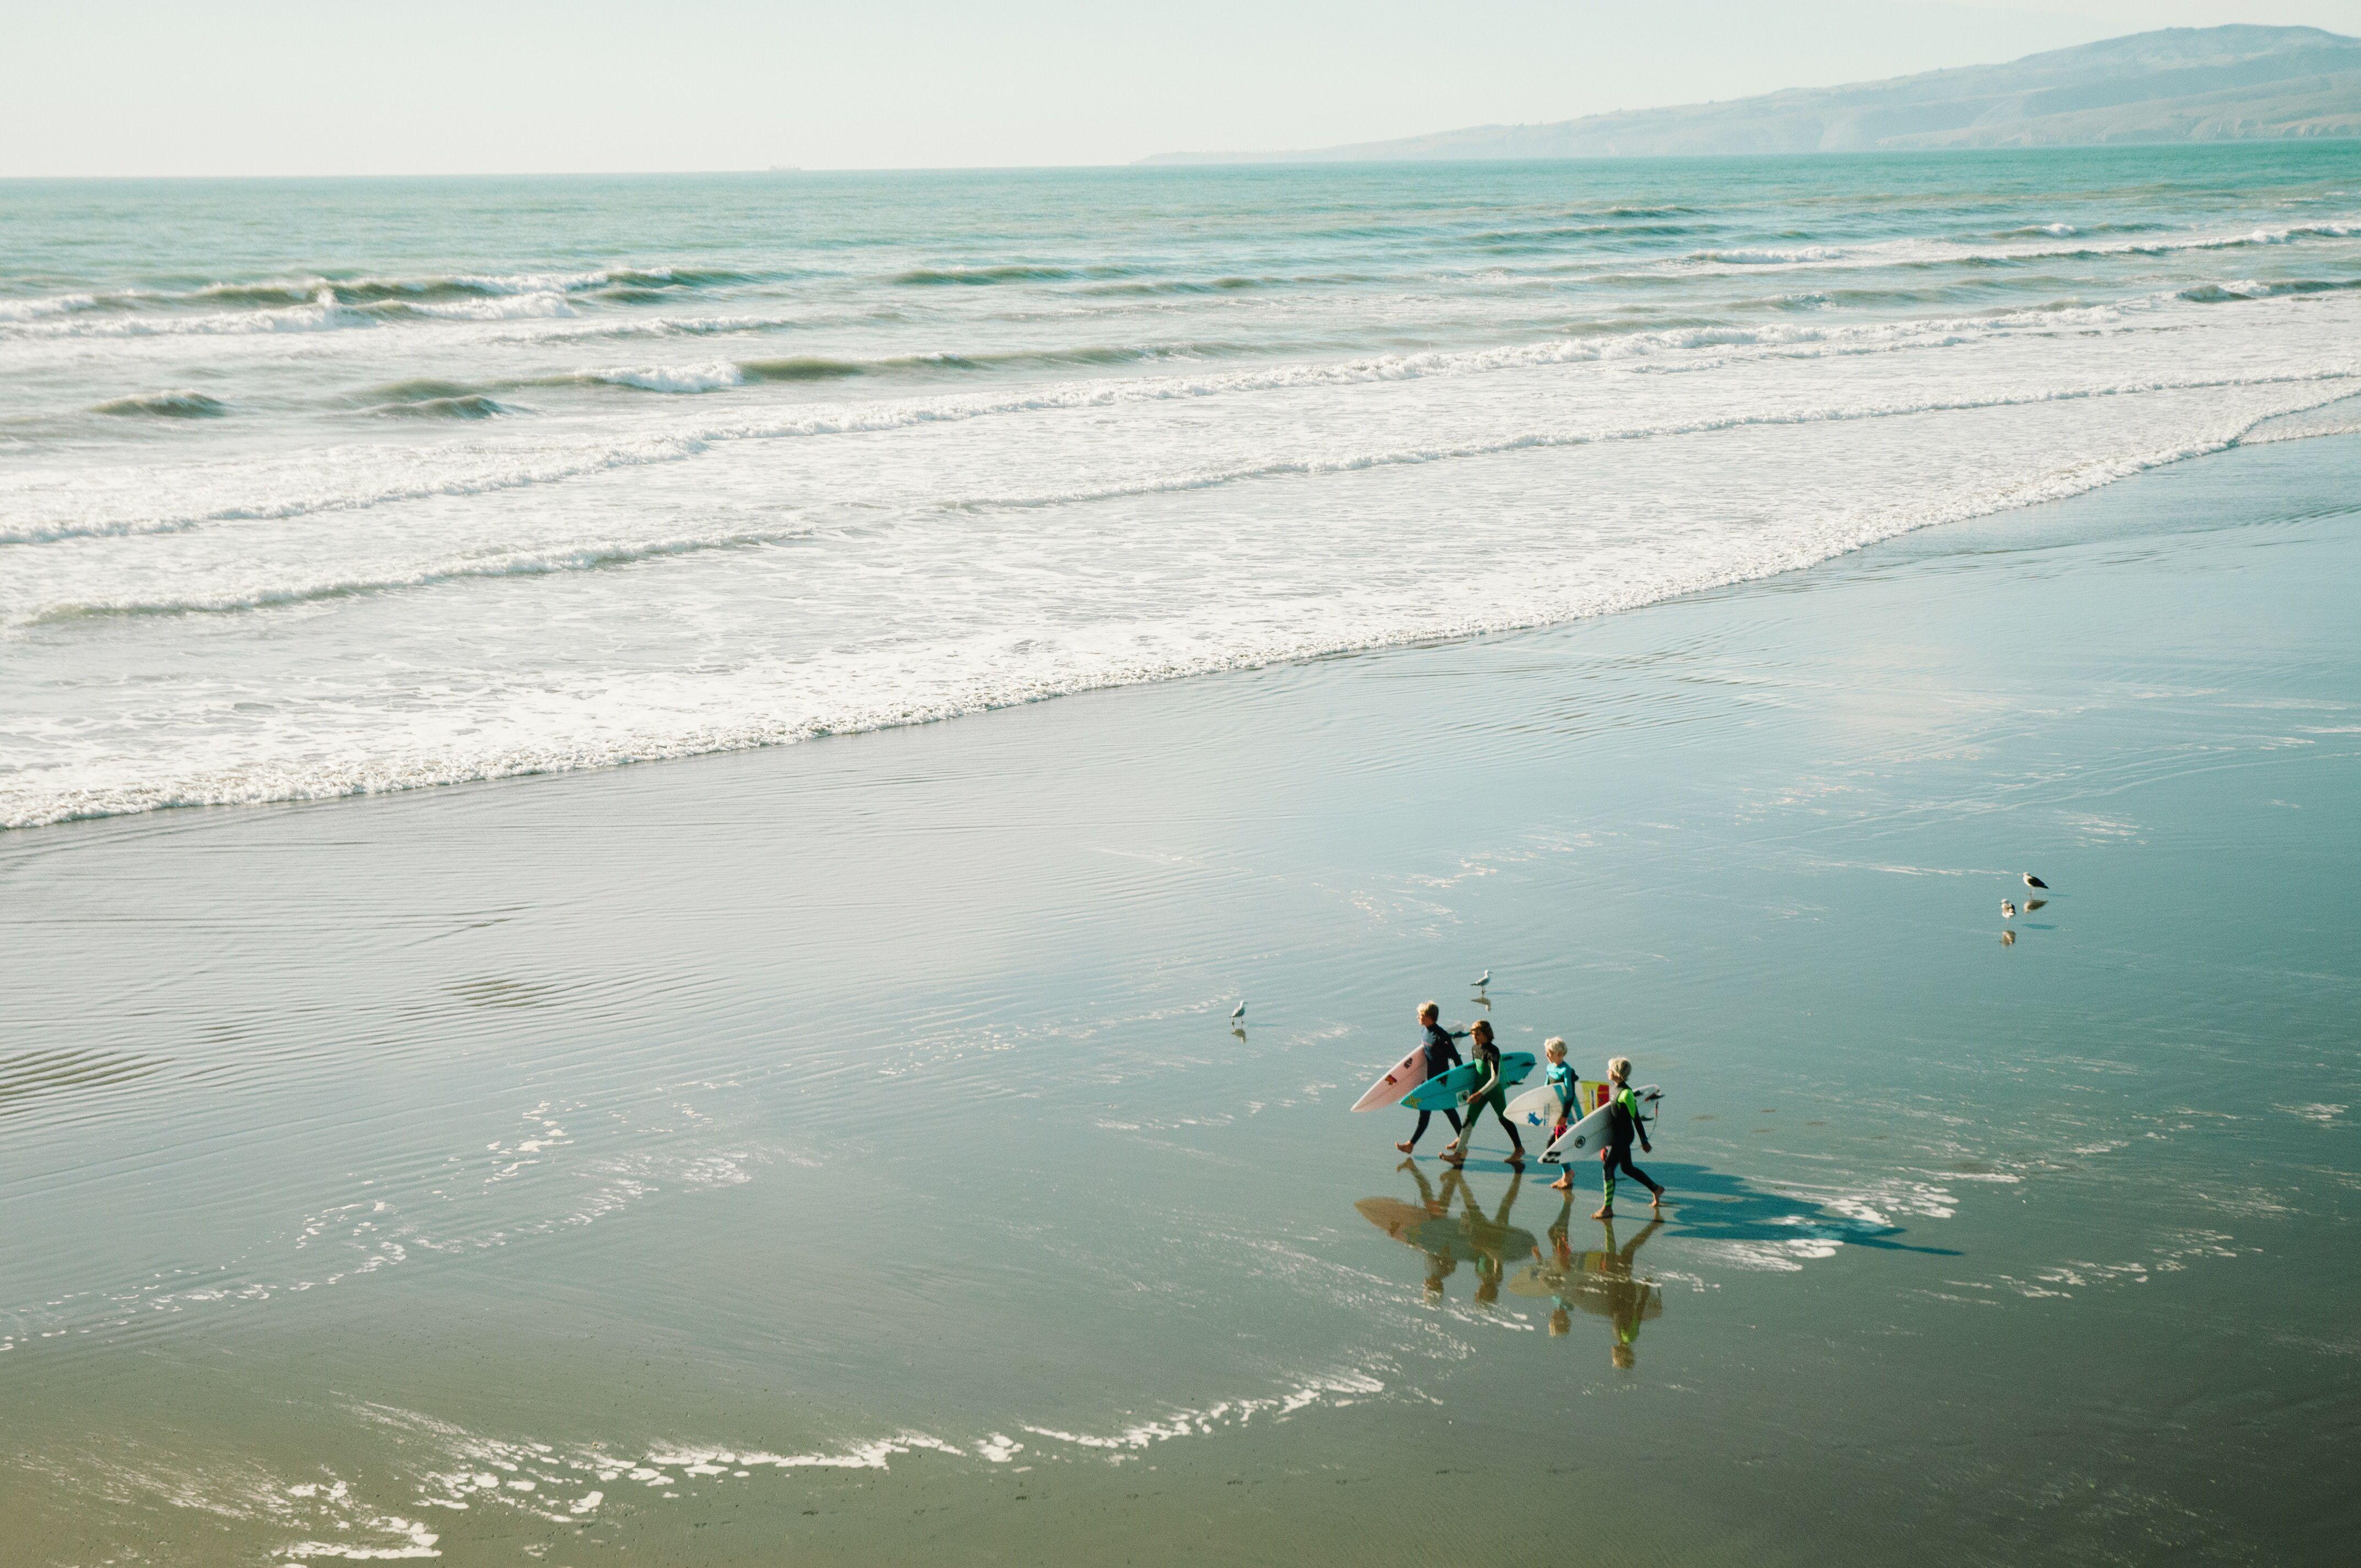 New Brighton Christchurch New Zealand Agodagiift Life Is An Adventure Surfing Beach